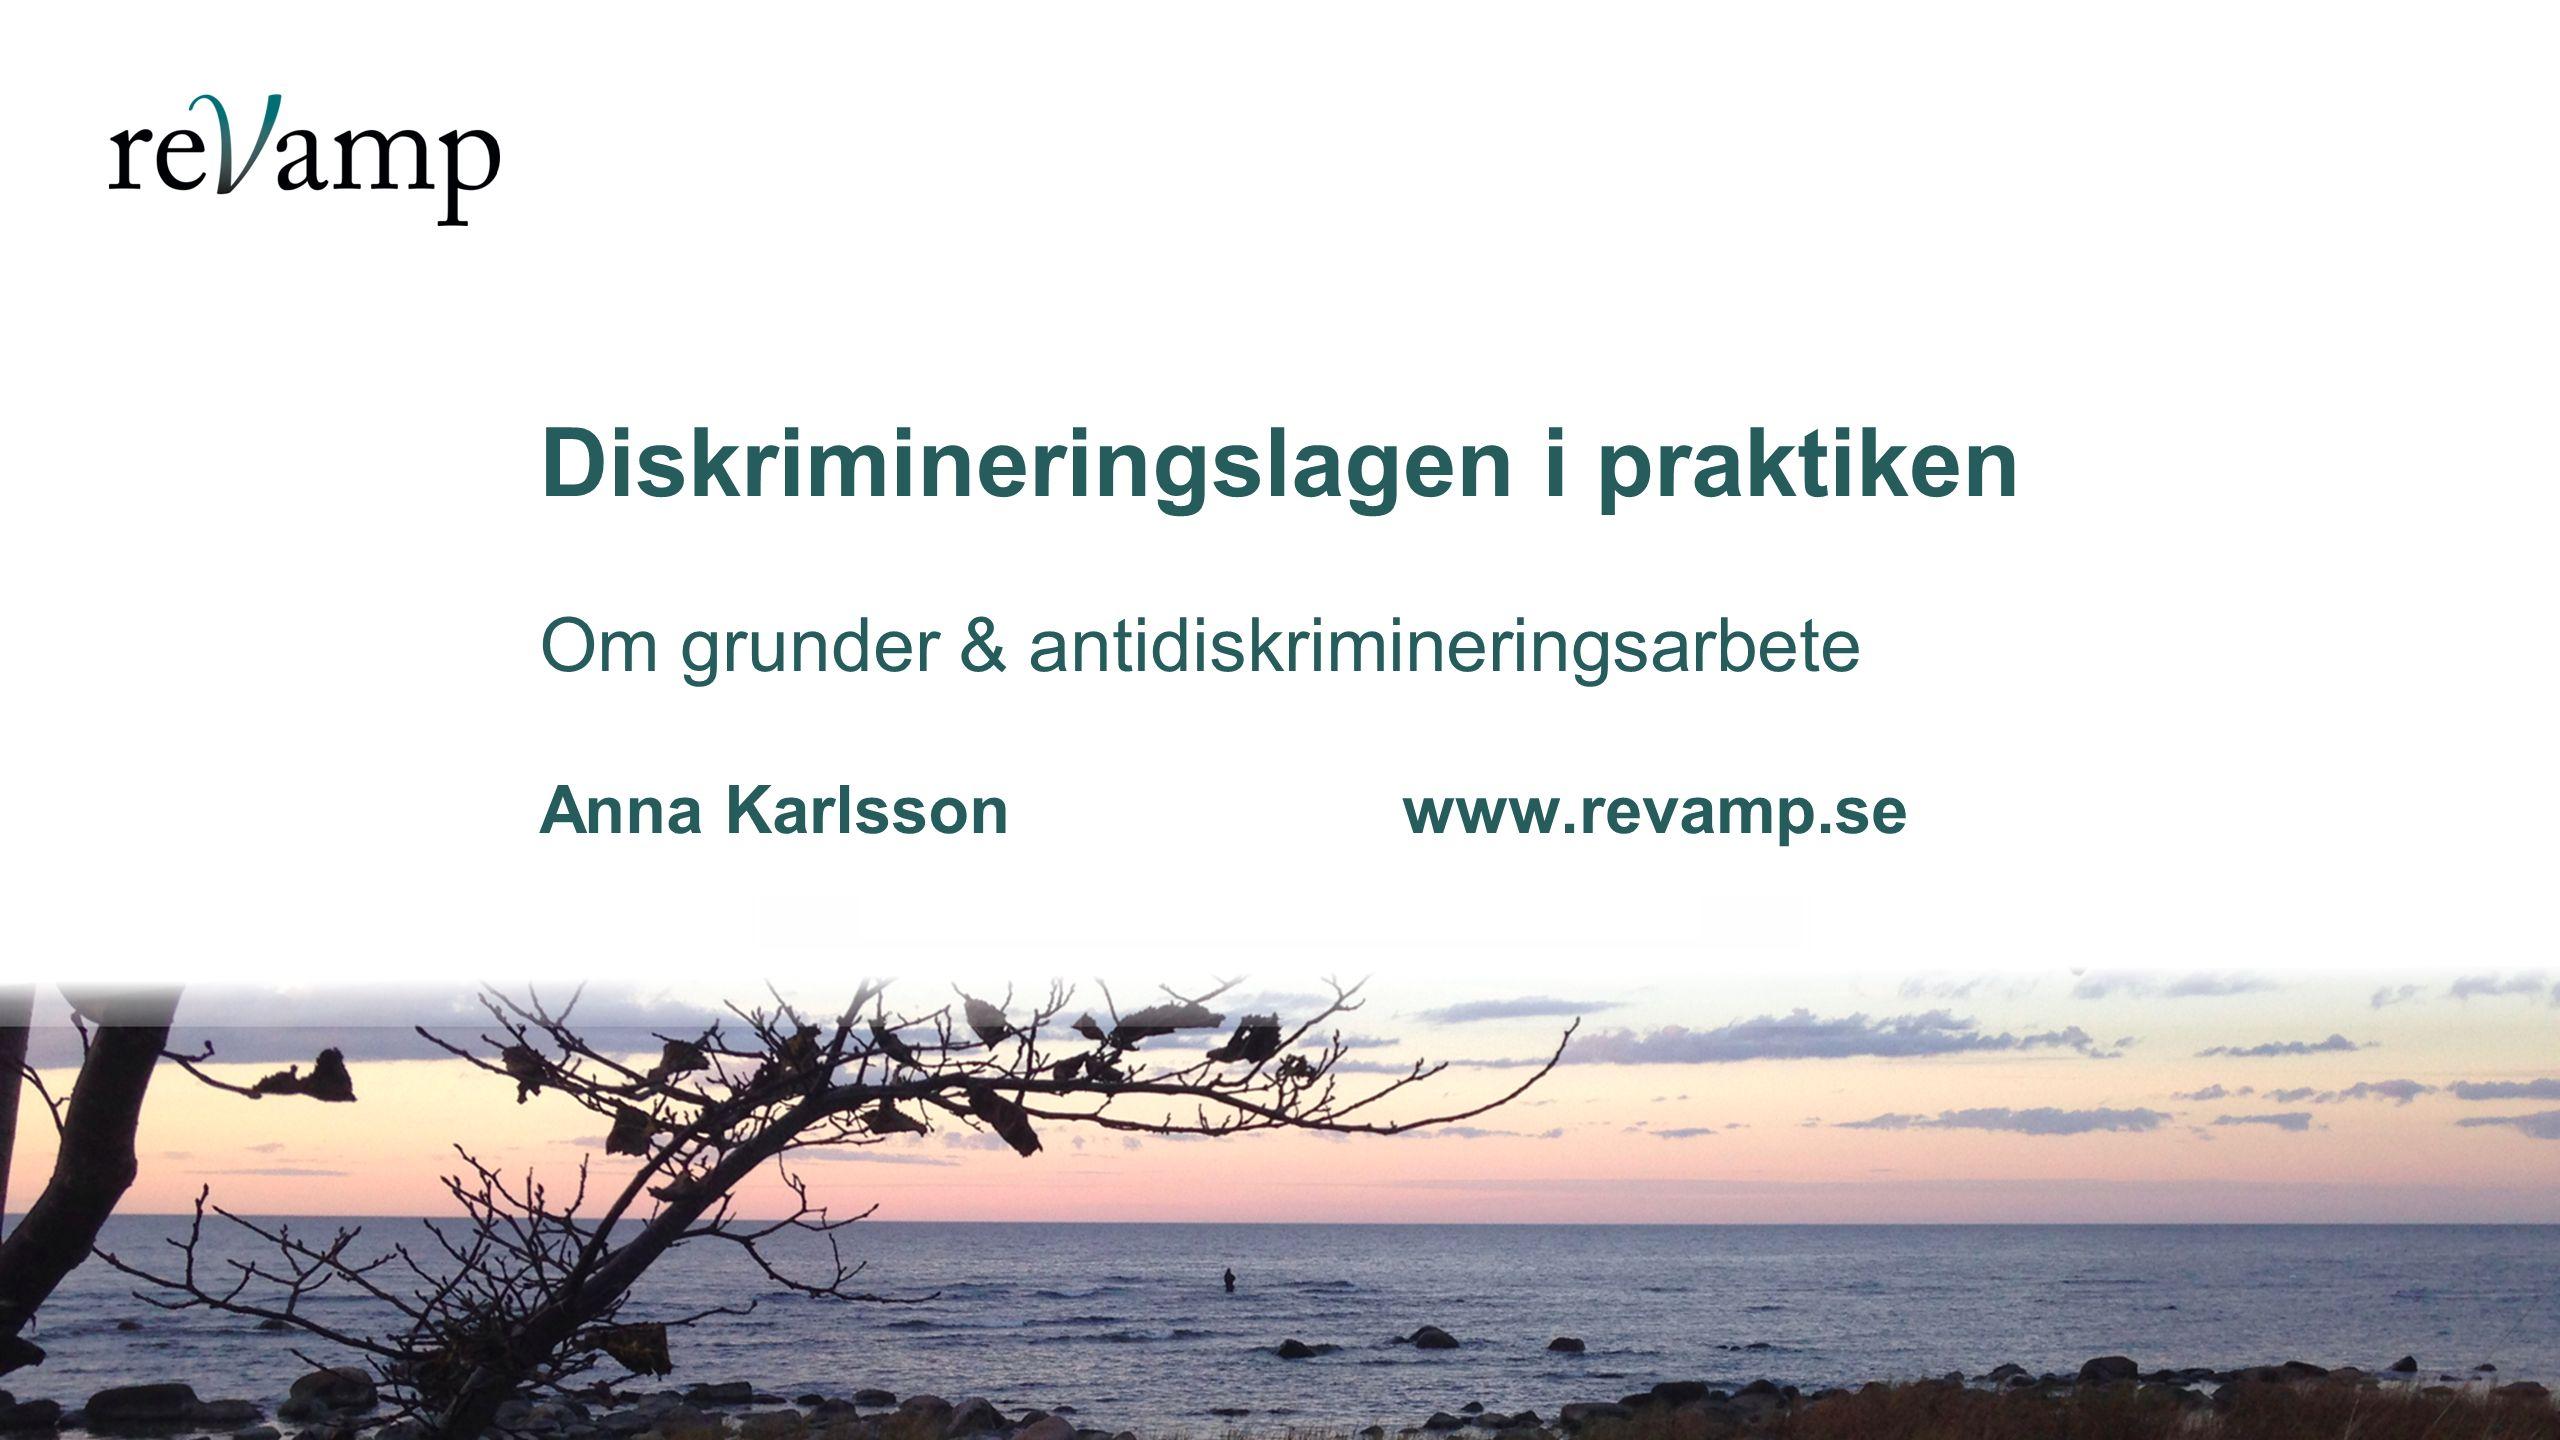 Diskrimineringslagen i praktiken Om grunder & antidiskrimineringsarbete Anna Karlsson www.revamp.se